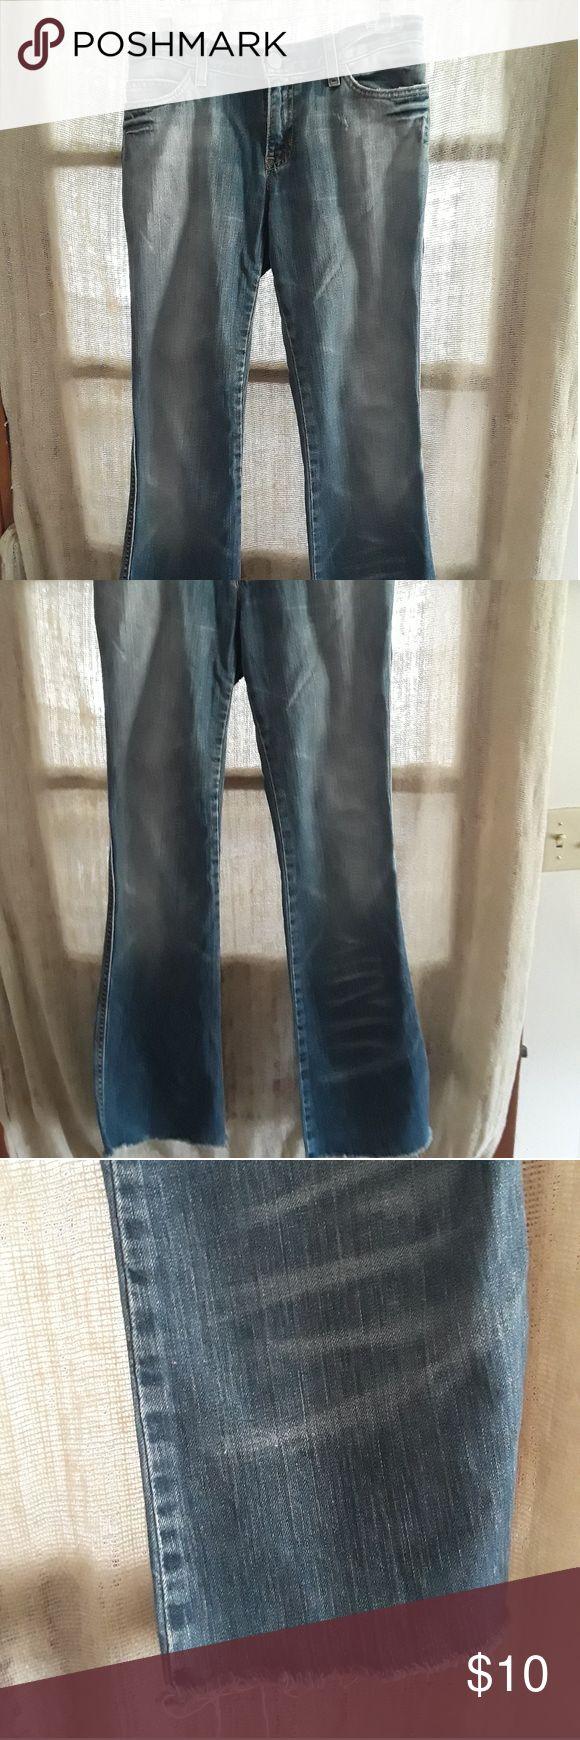 I just added this listing on Poshmark: GAP Ultra LOW Rise Jeans. #shopmycloset #poshmark #fashion #shopping #style #forsale #GAP #Denim